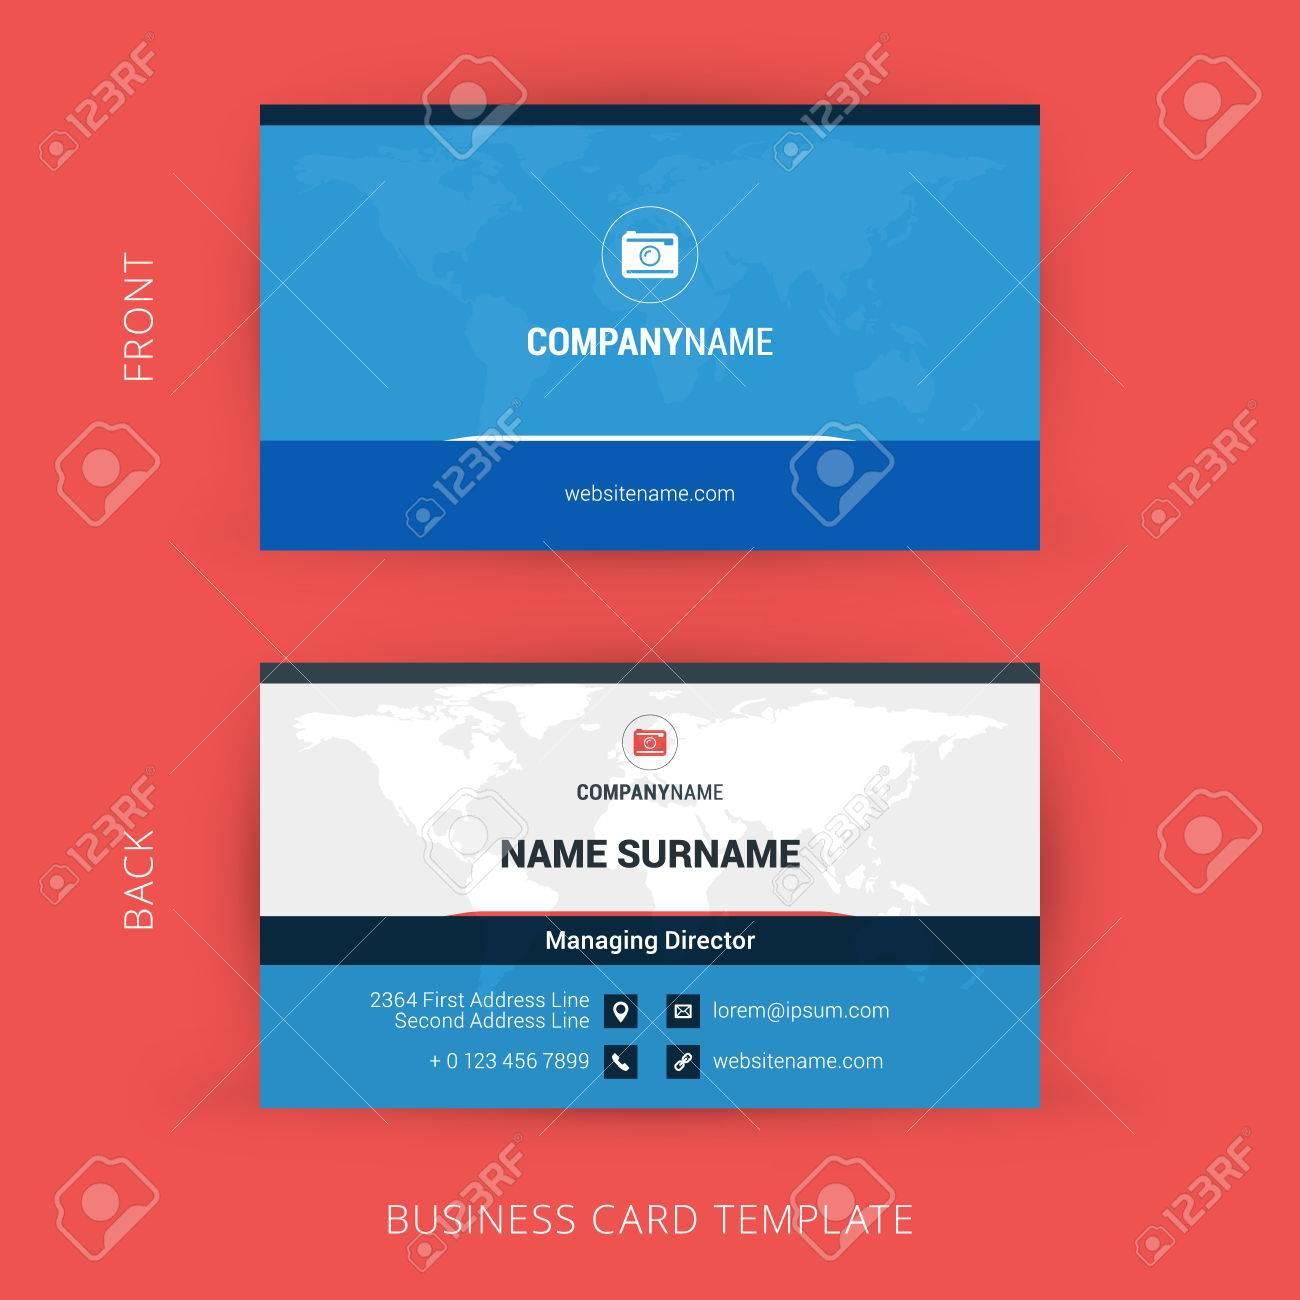 Modle De Carte Visite Creative Et Propre D